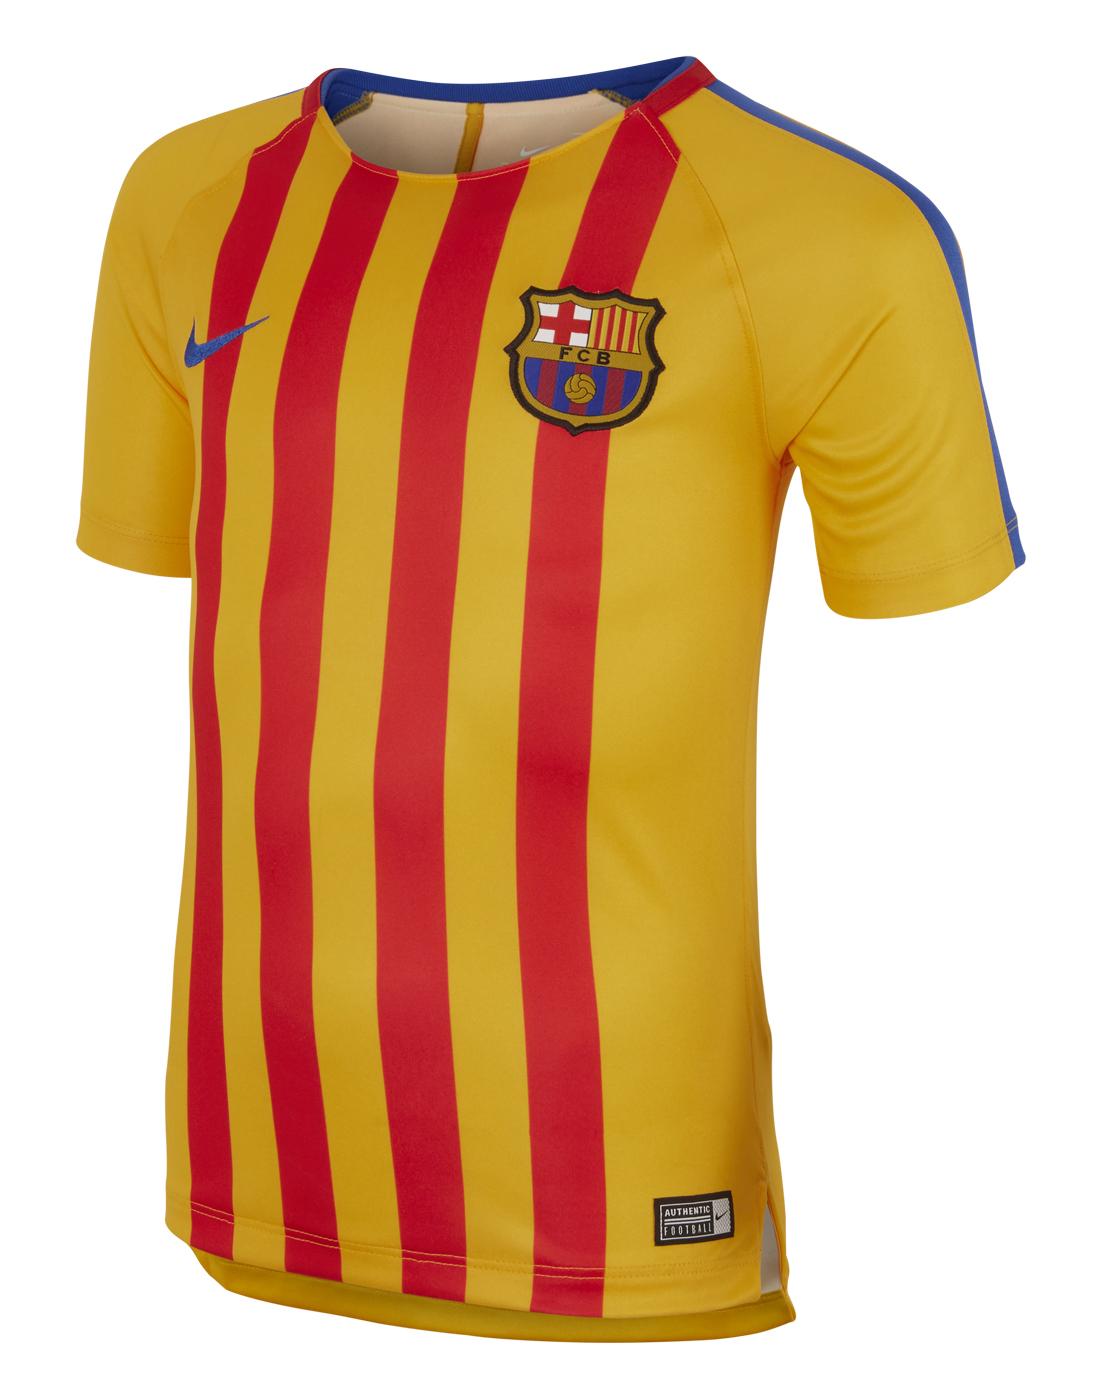 ... Kids Barcelona 17 18 Training Jersey ... 99b87c24a04